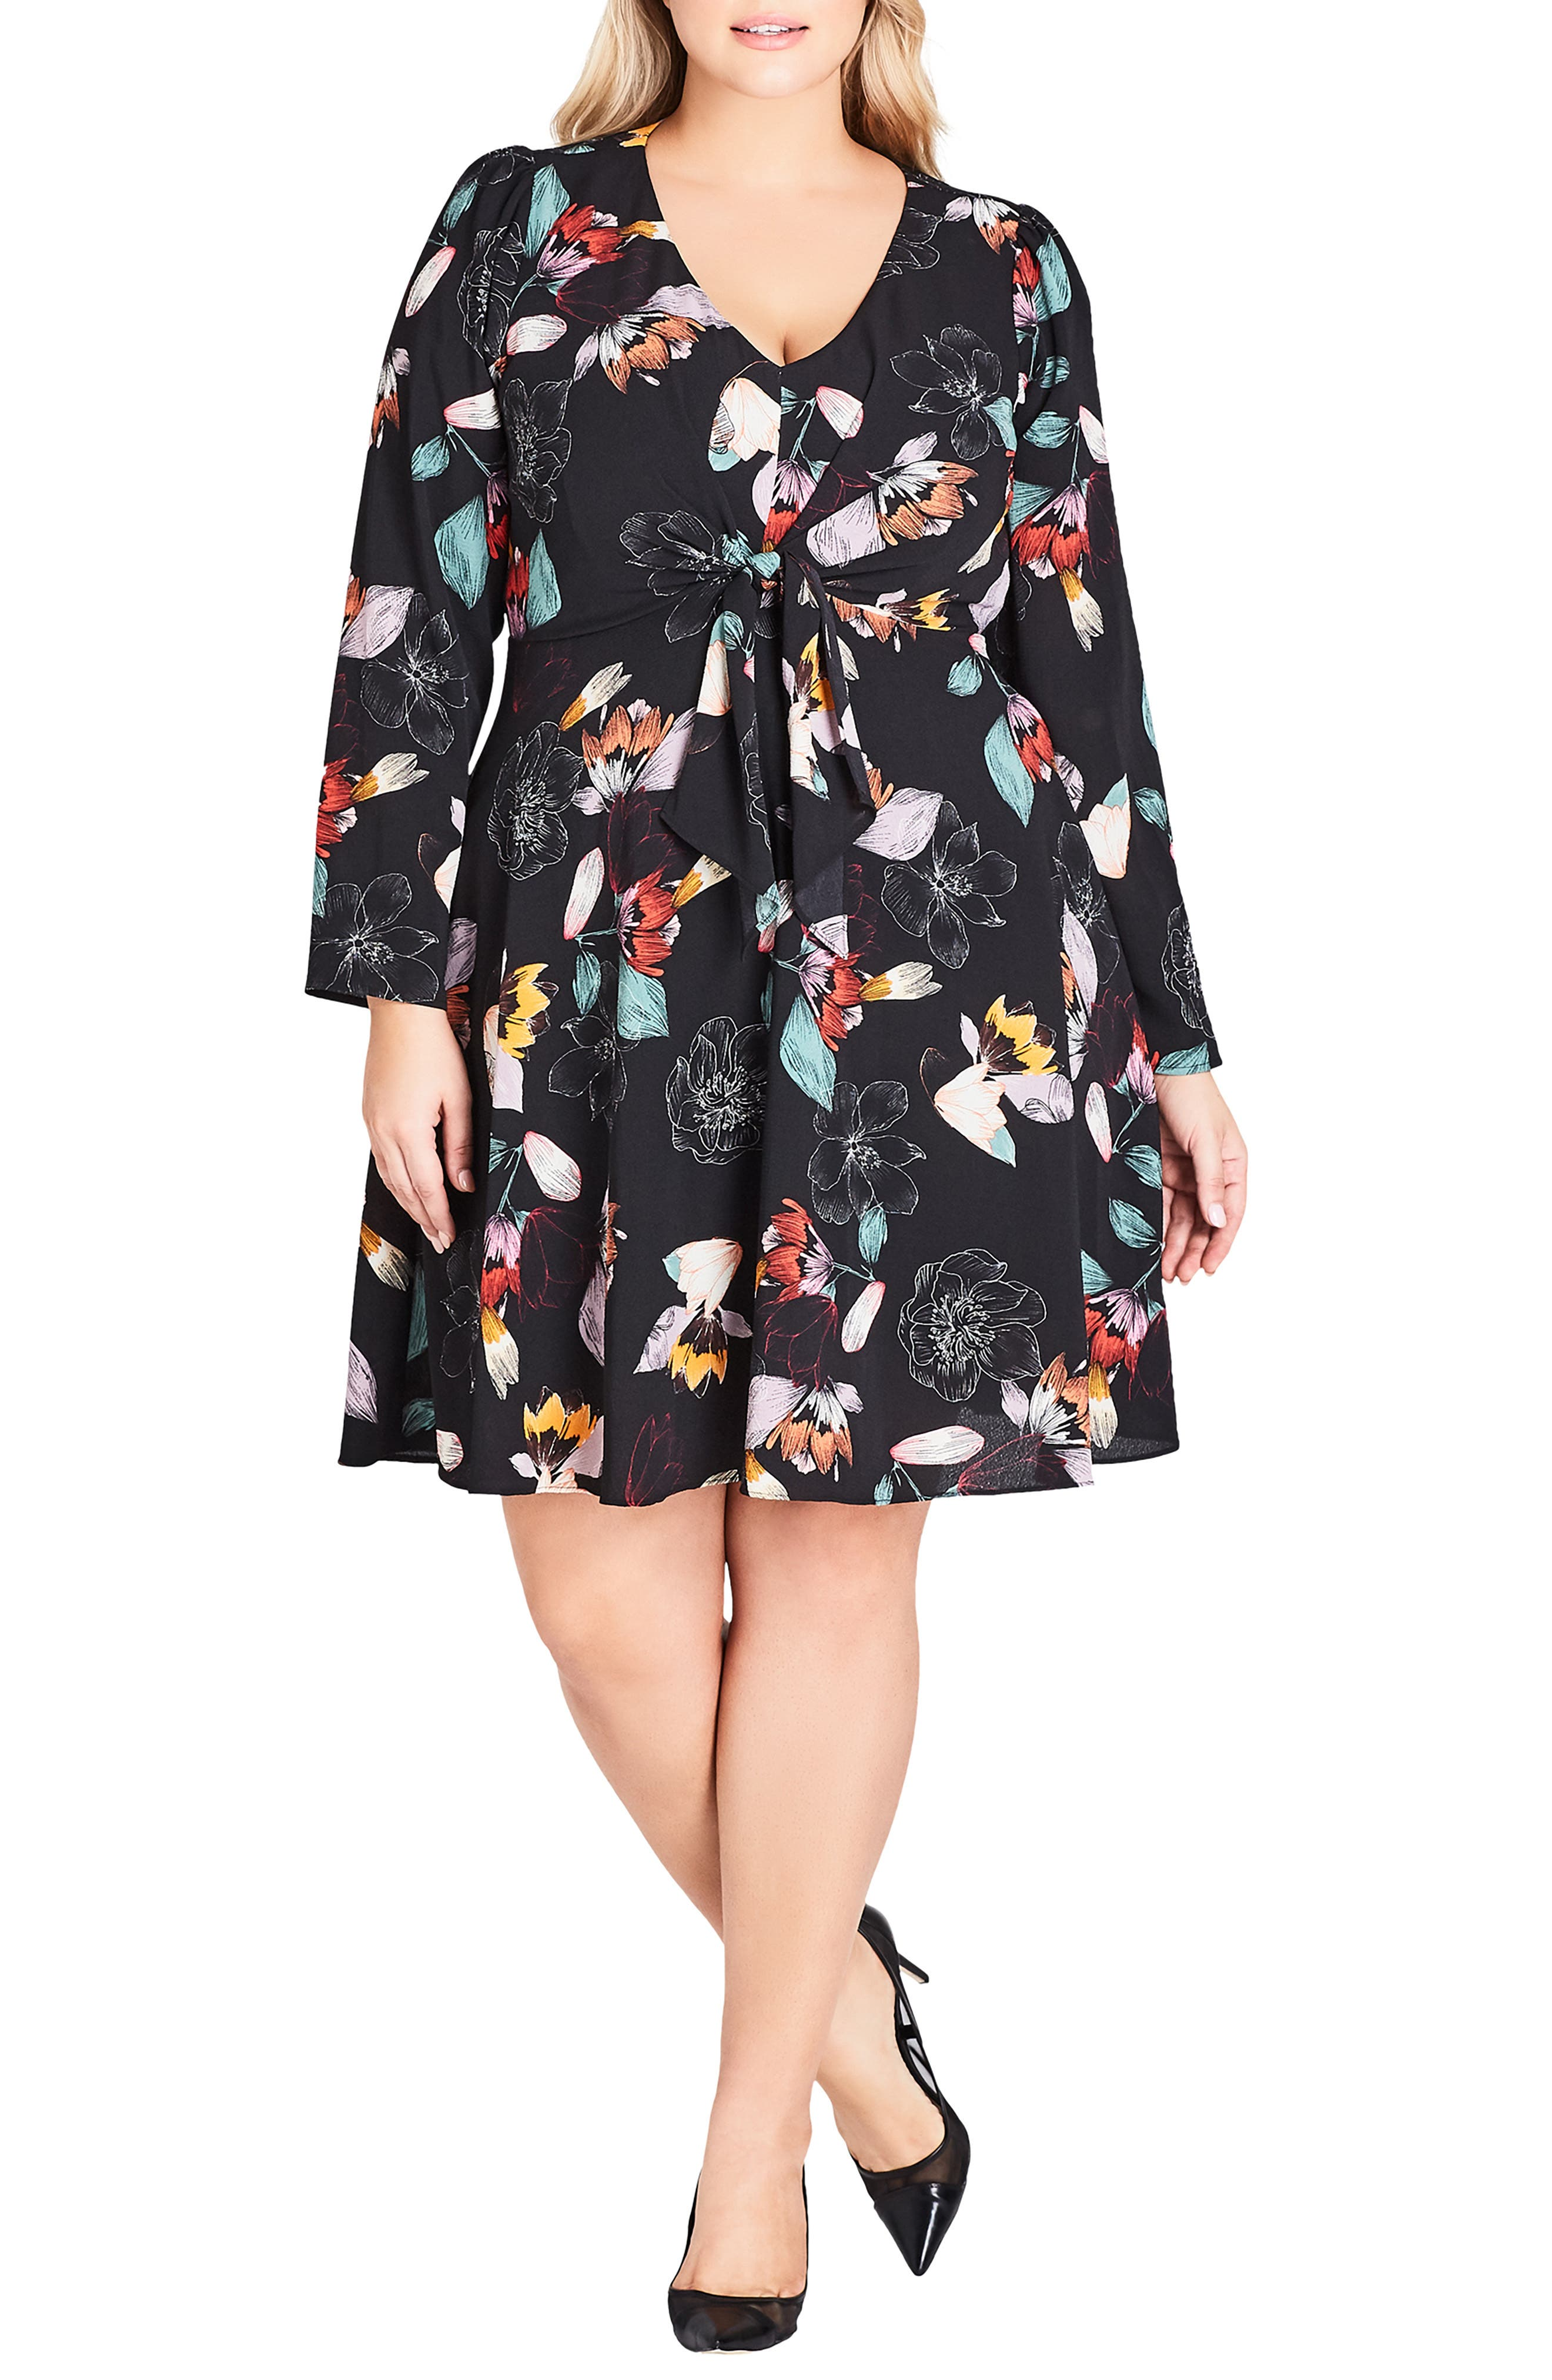 Plus Size City Chic Floral Sketch Fit & Flare Dress, Black